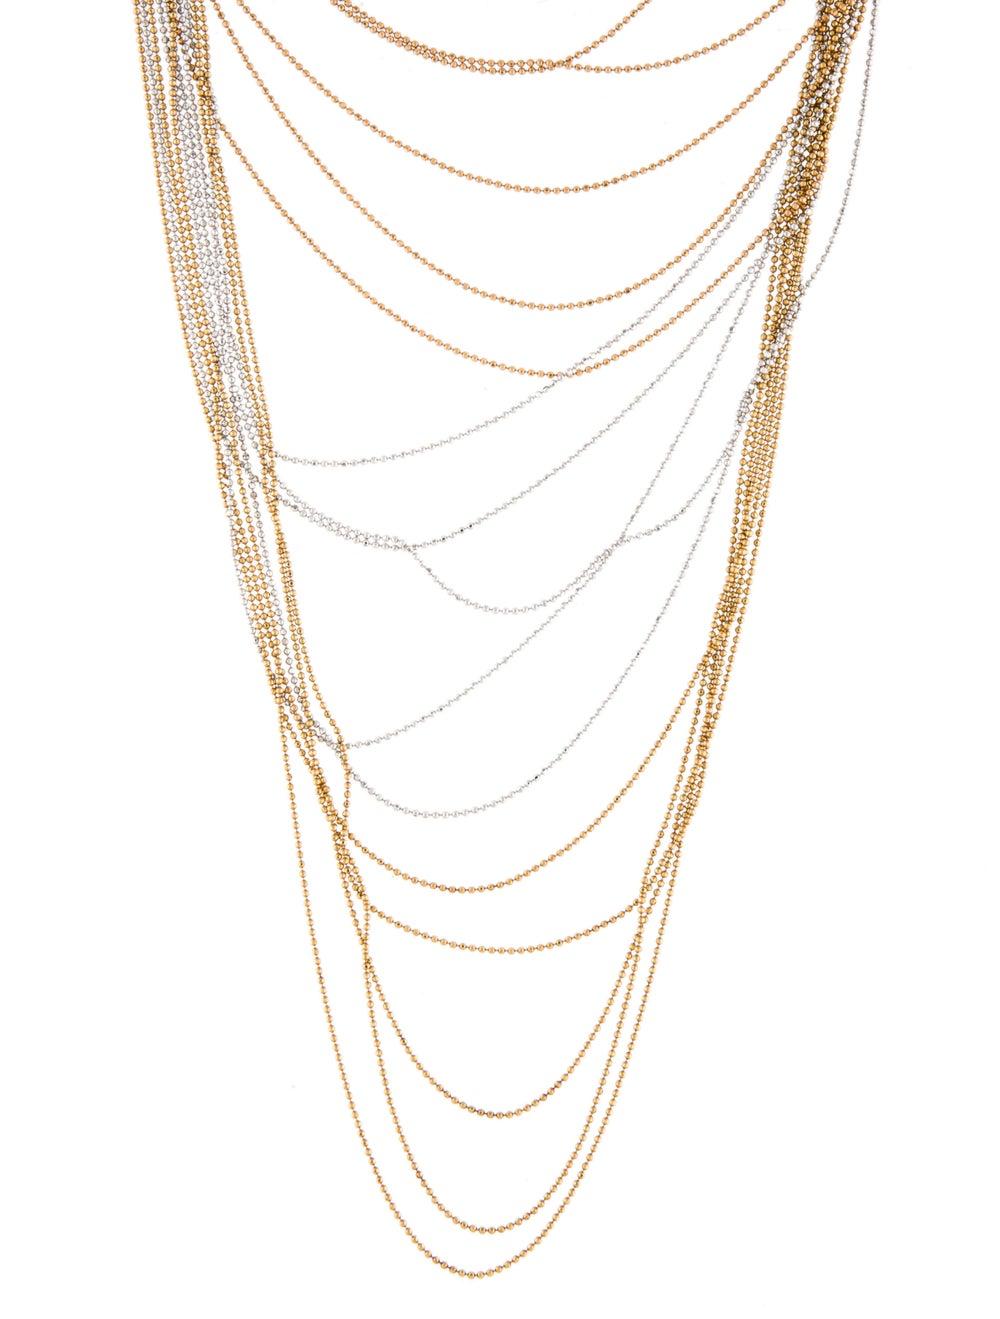 Necklace 18K Multi-Strand Chain Necklace White - image 3